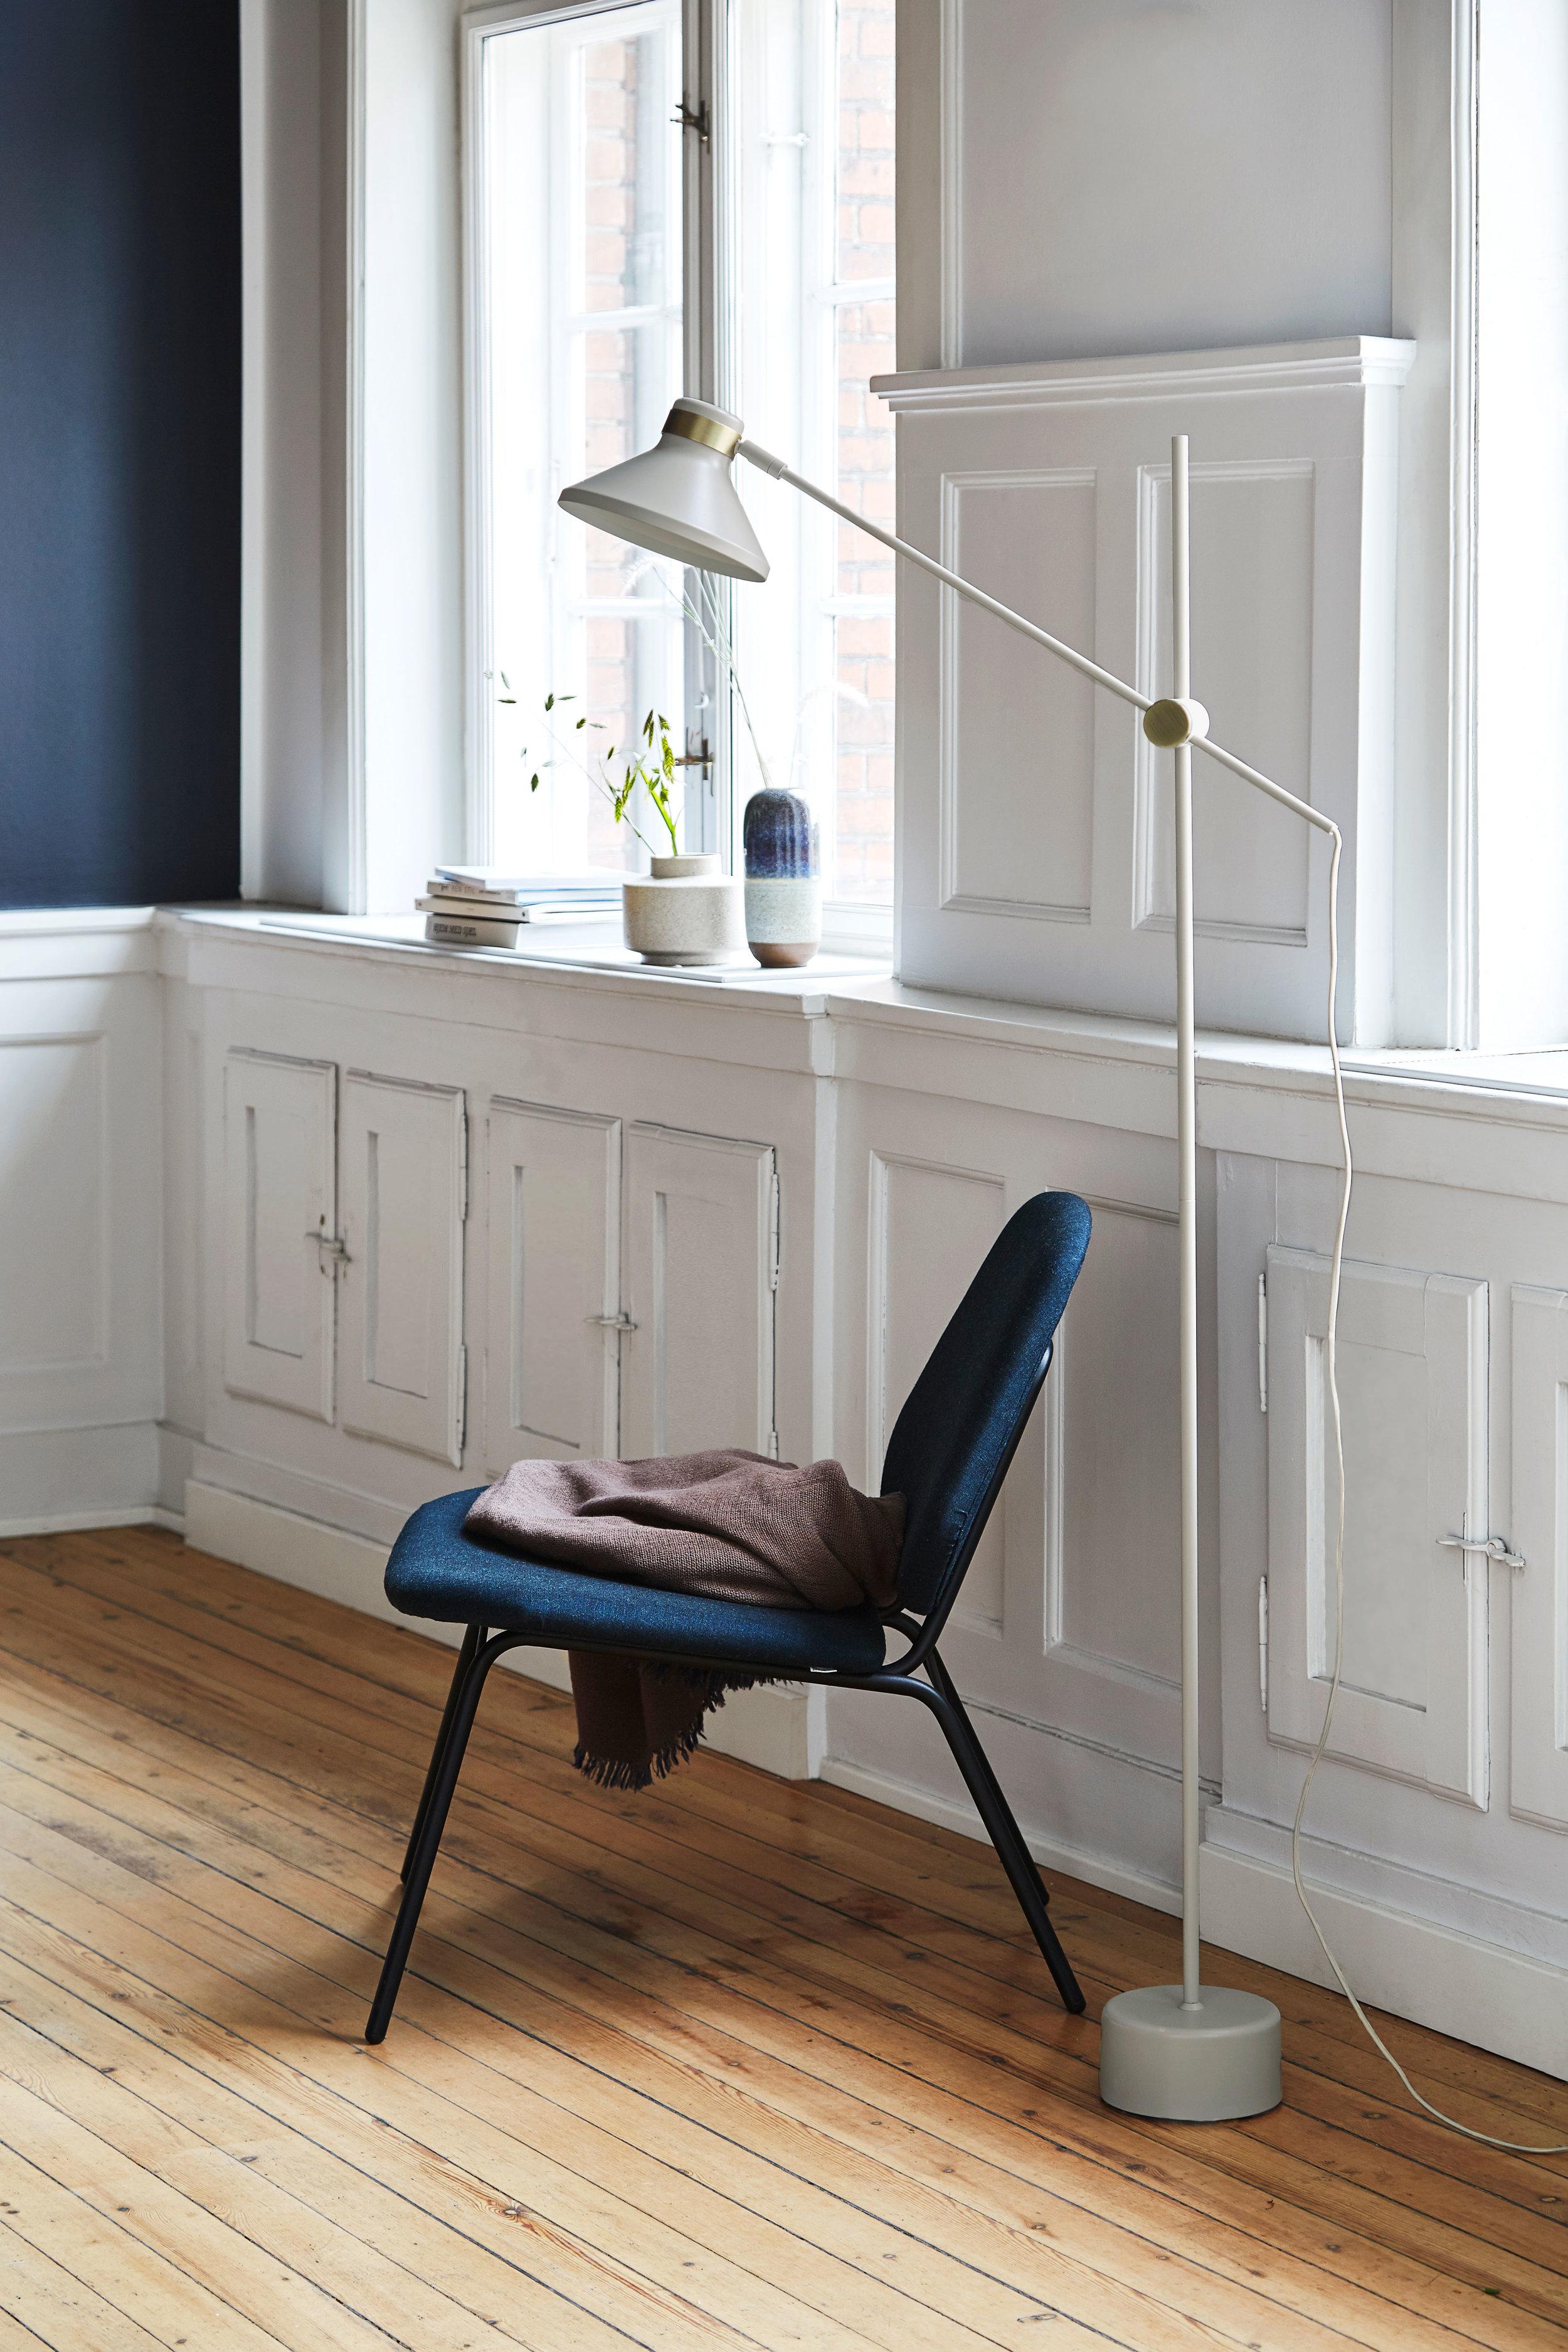 Floor lamp with fabric cord.. Dimensions: H140 cm | Shade: ø19 cm Variants: Black | Taupe | Dark Blue Designer: Frandsen Design Studio    MORE